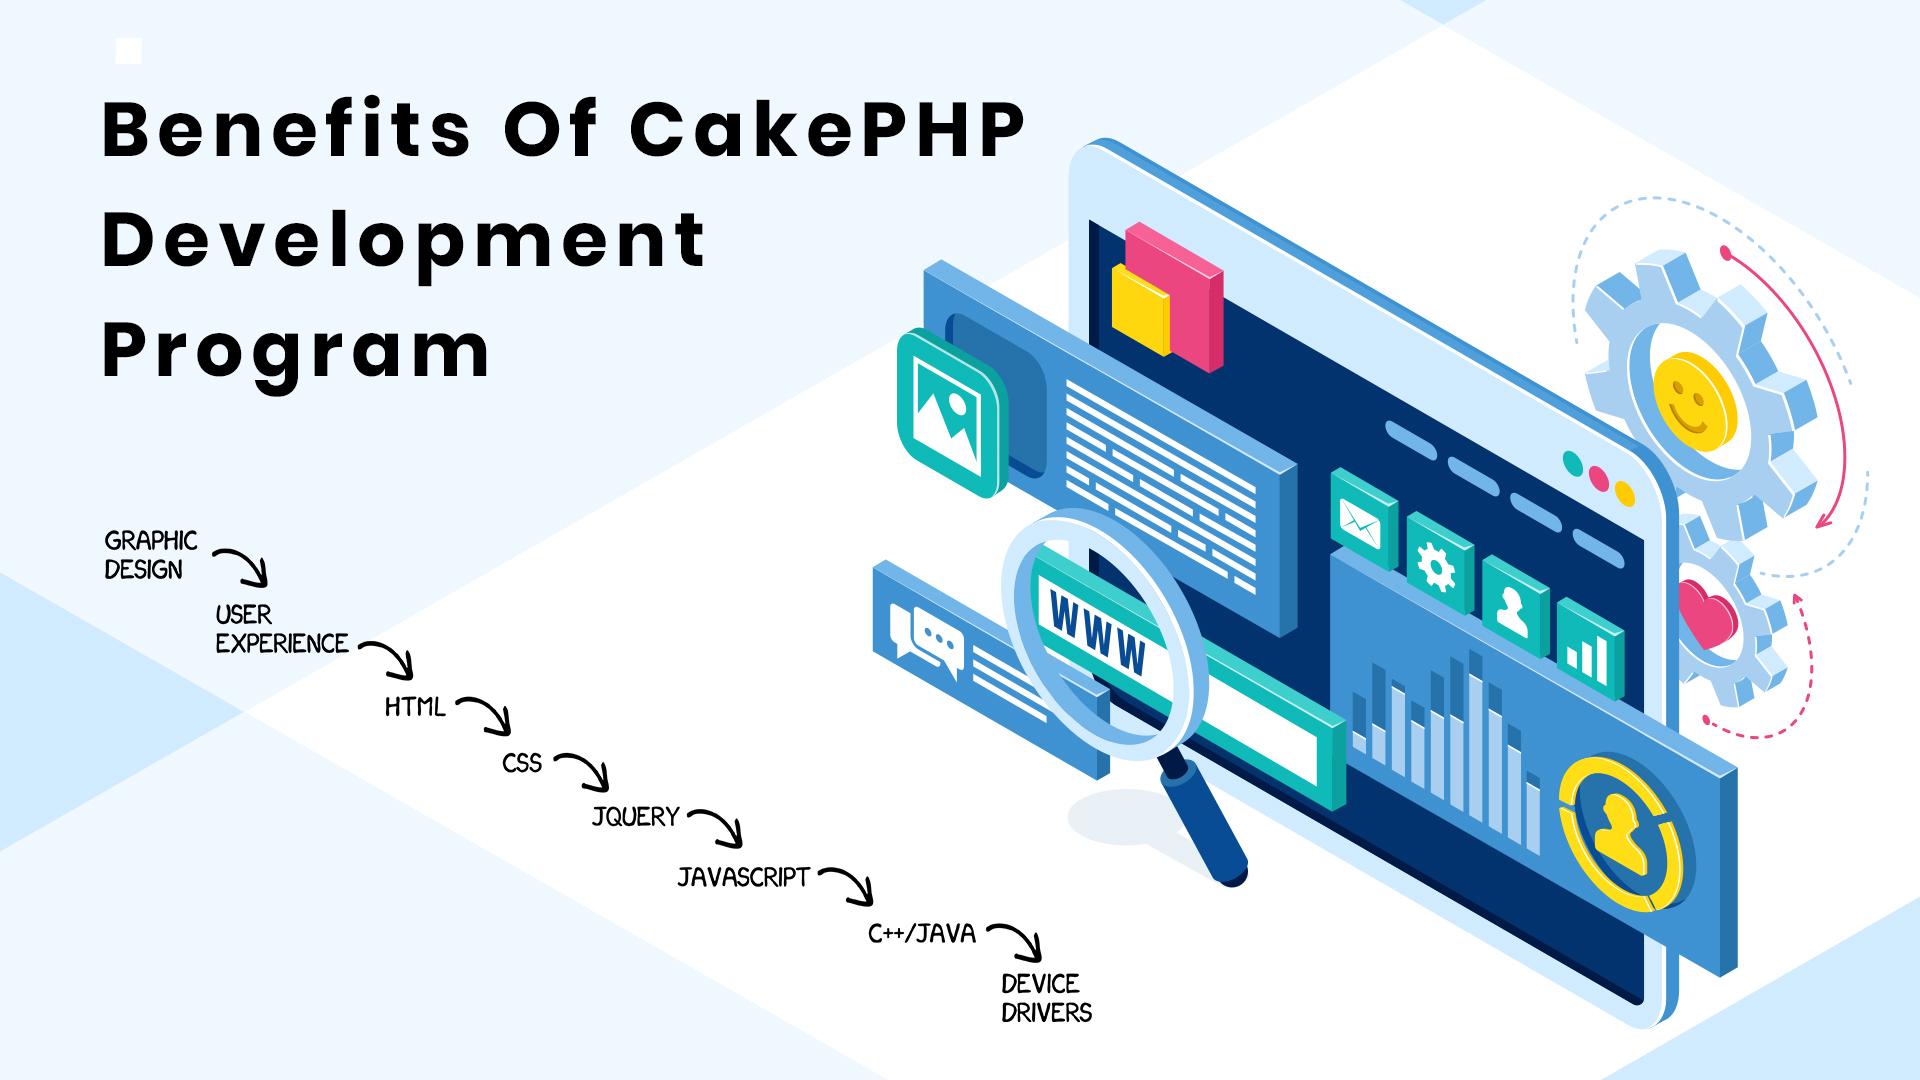 Benefits Of CakePHP Development Program